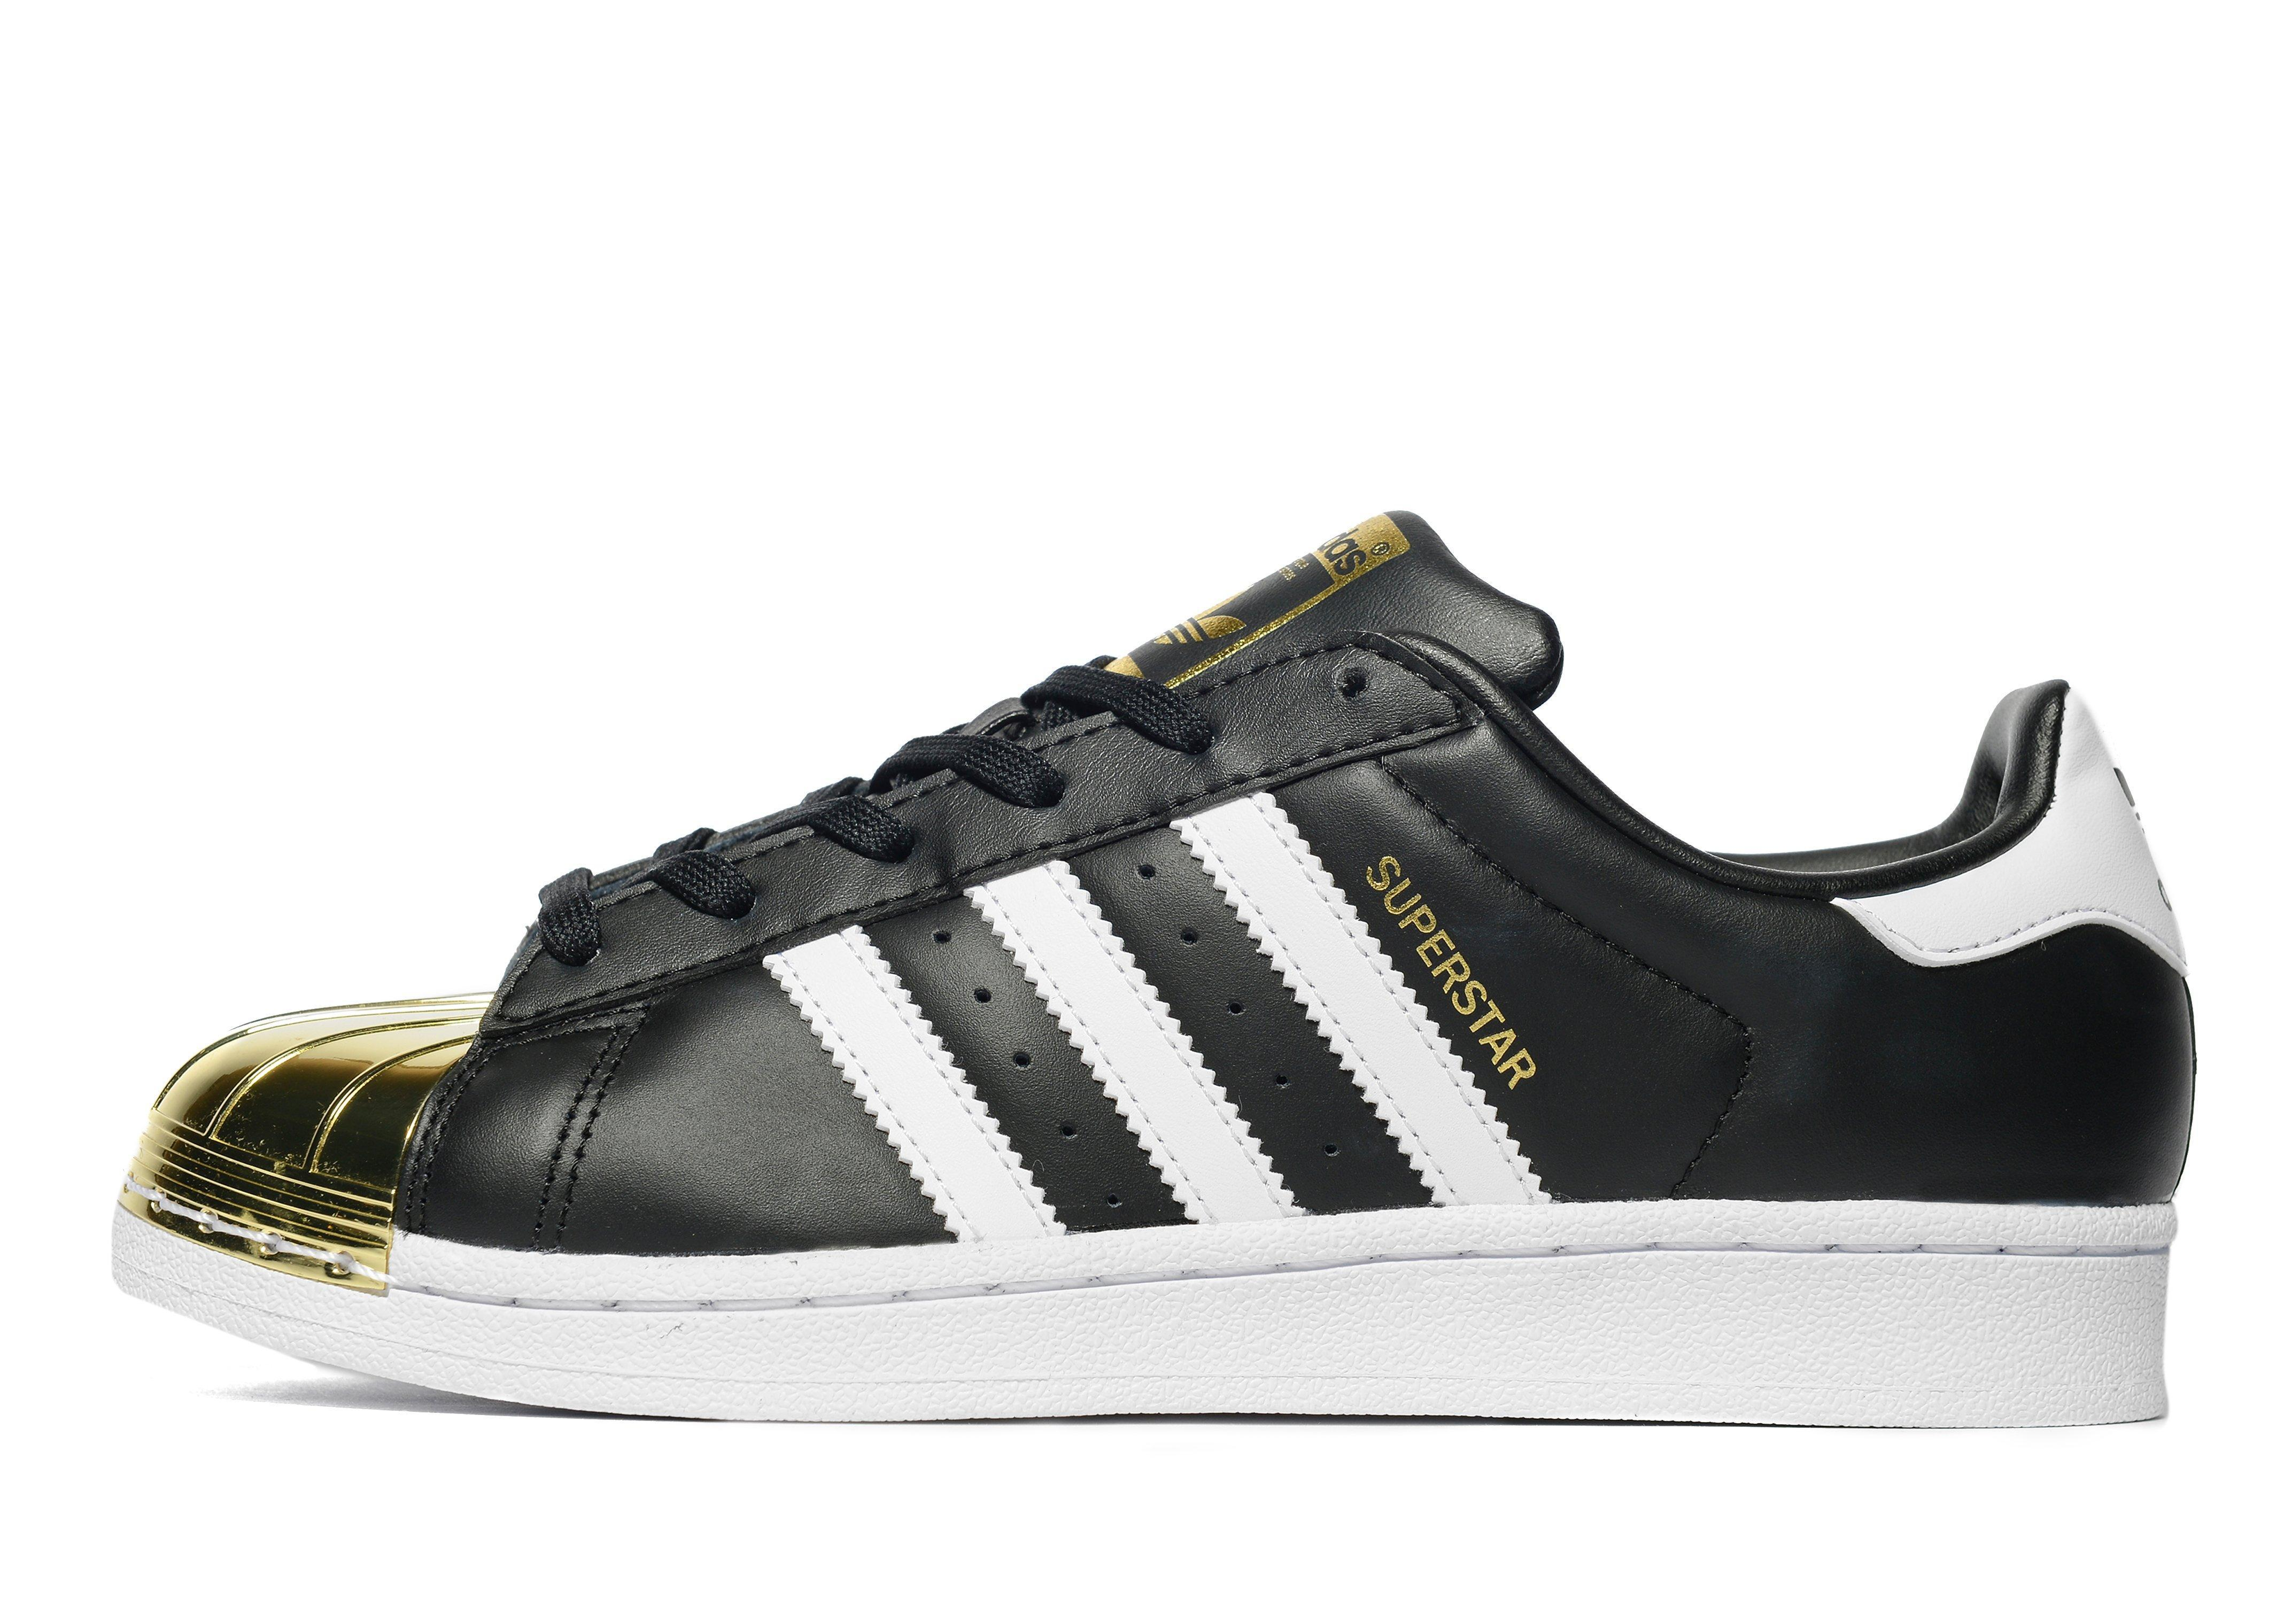 newest 1c517 5d907 Adidas originals Superstar Metal Toe in Black  Lyst